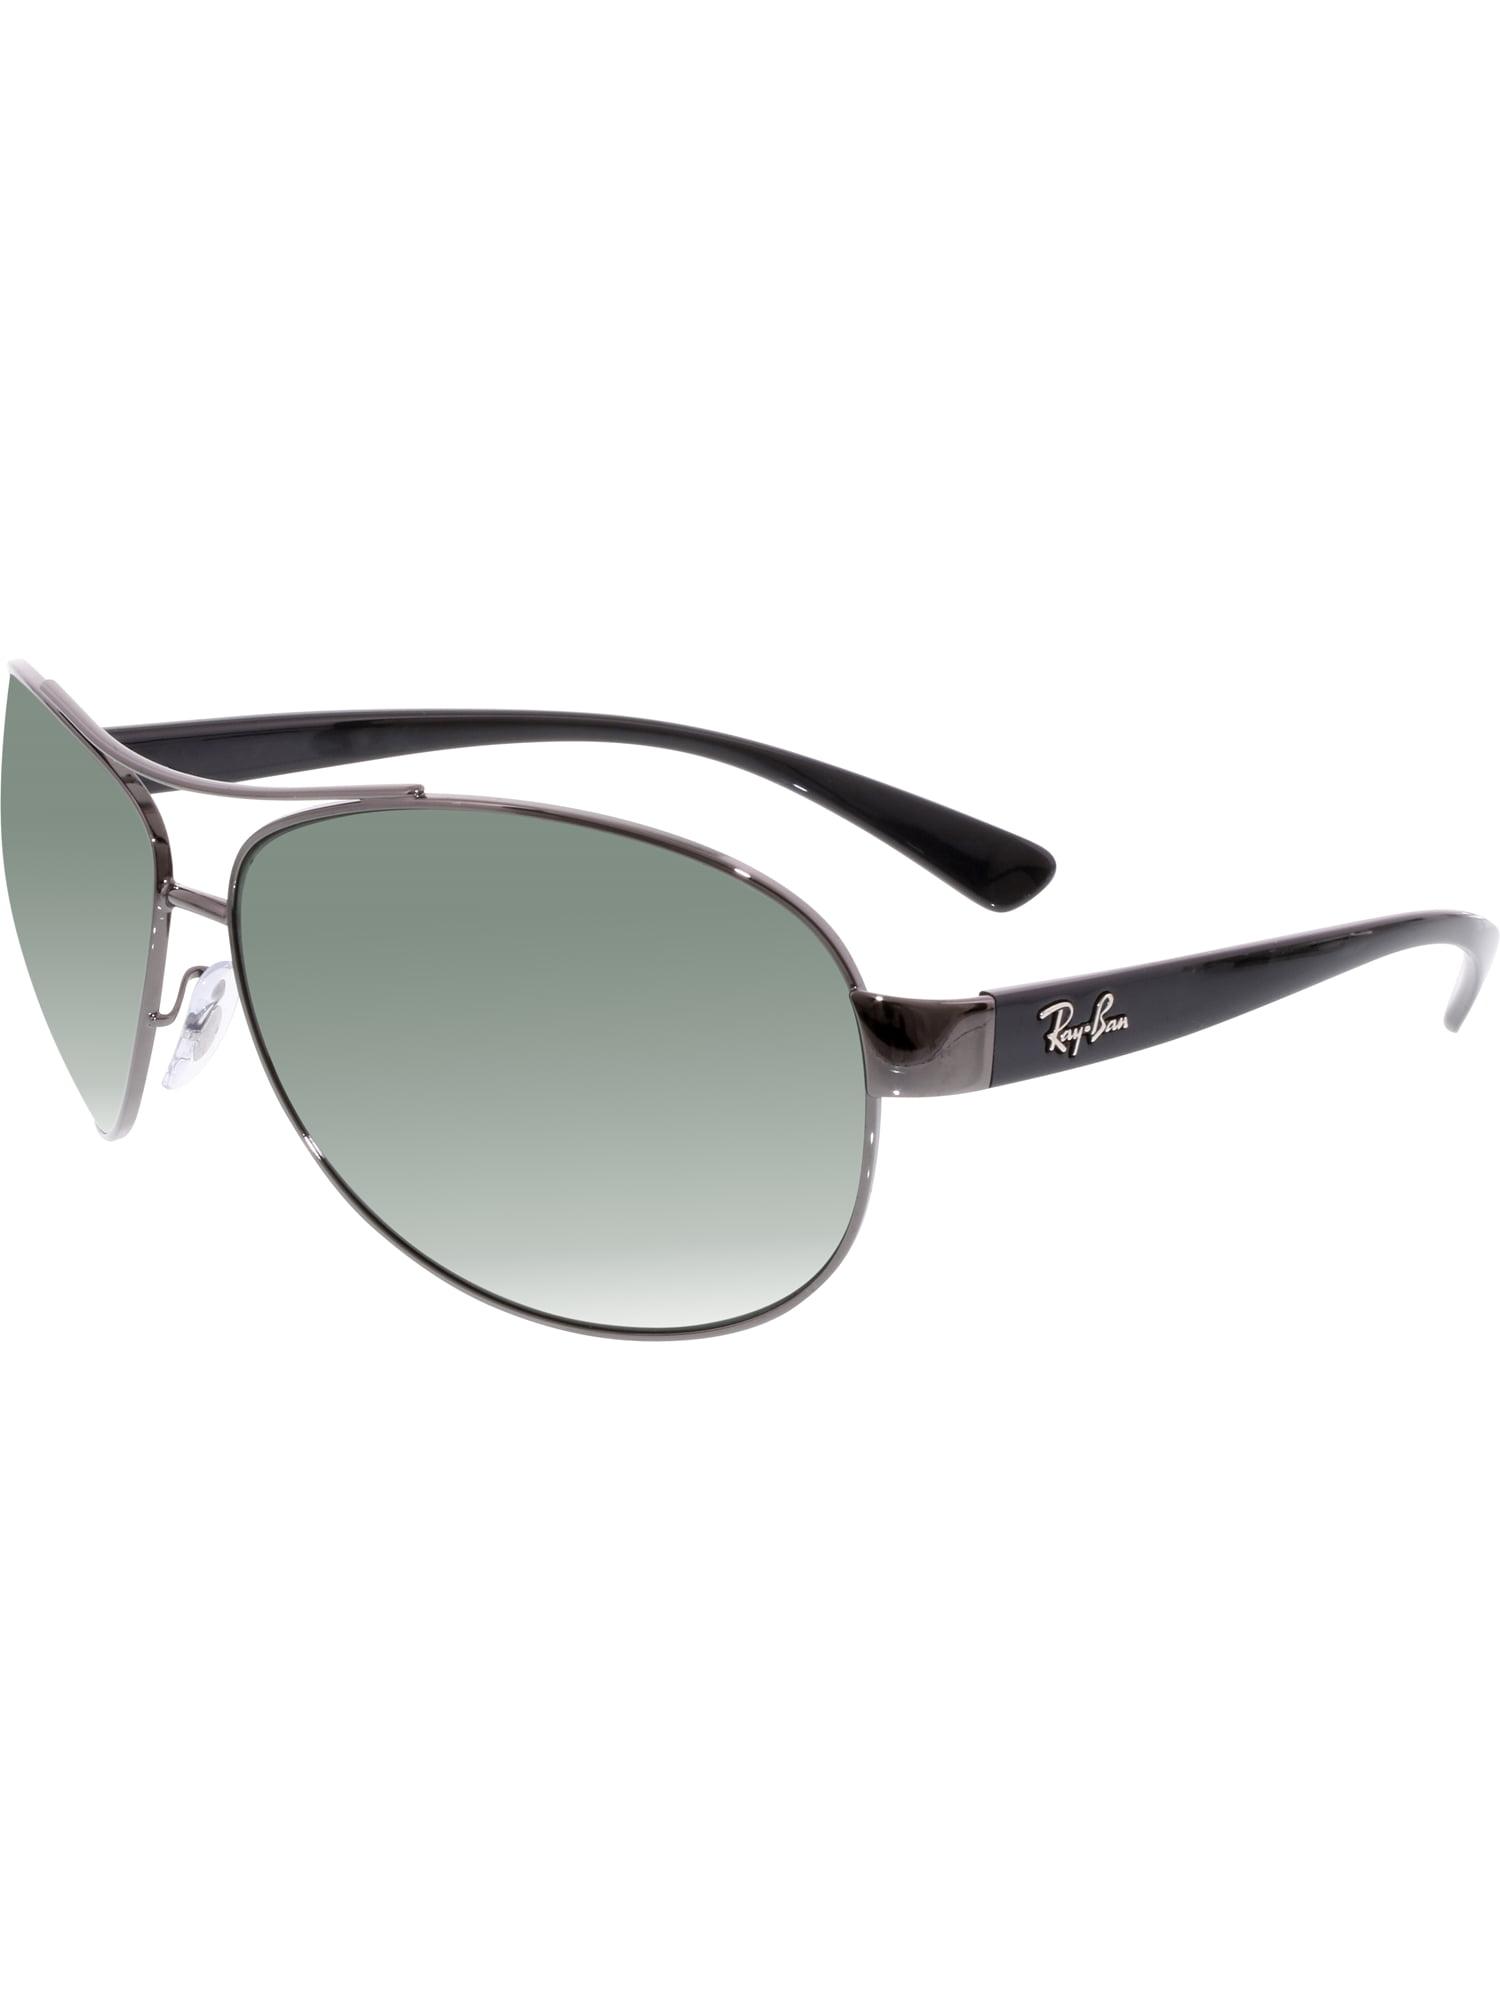 45751e83fa Ray-Ban Men s Active RB3386-004 71-67 Gunmetal Aviator Sunglasses